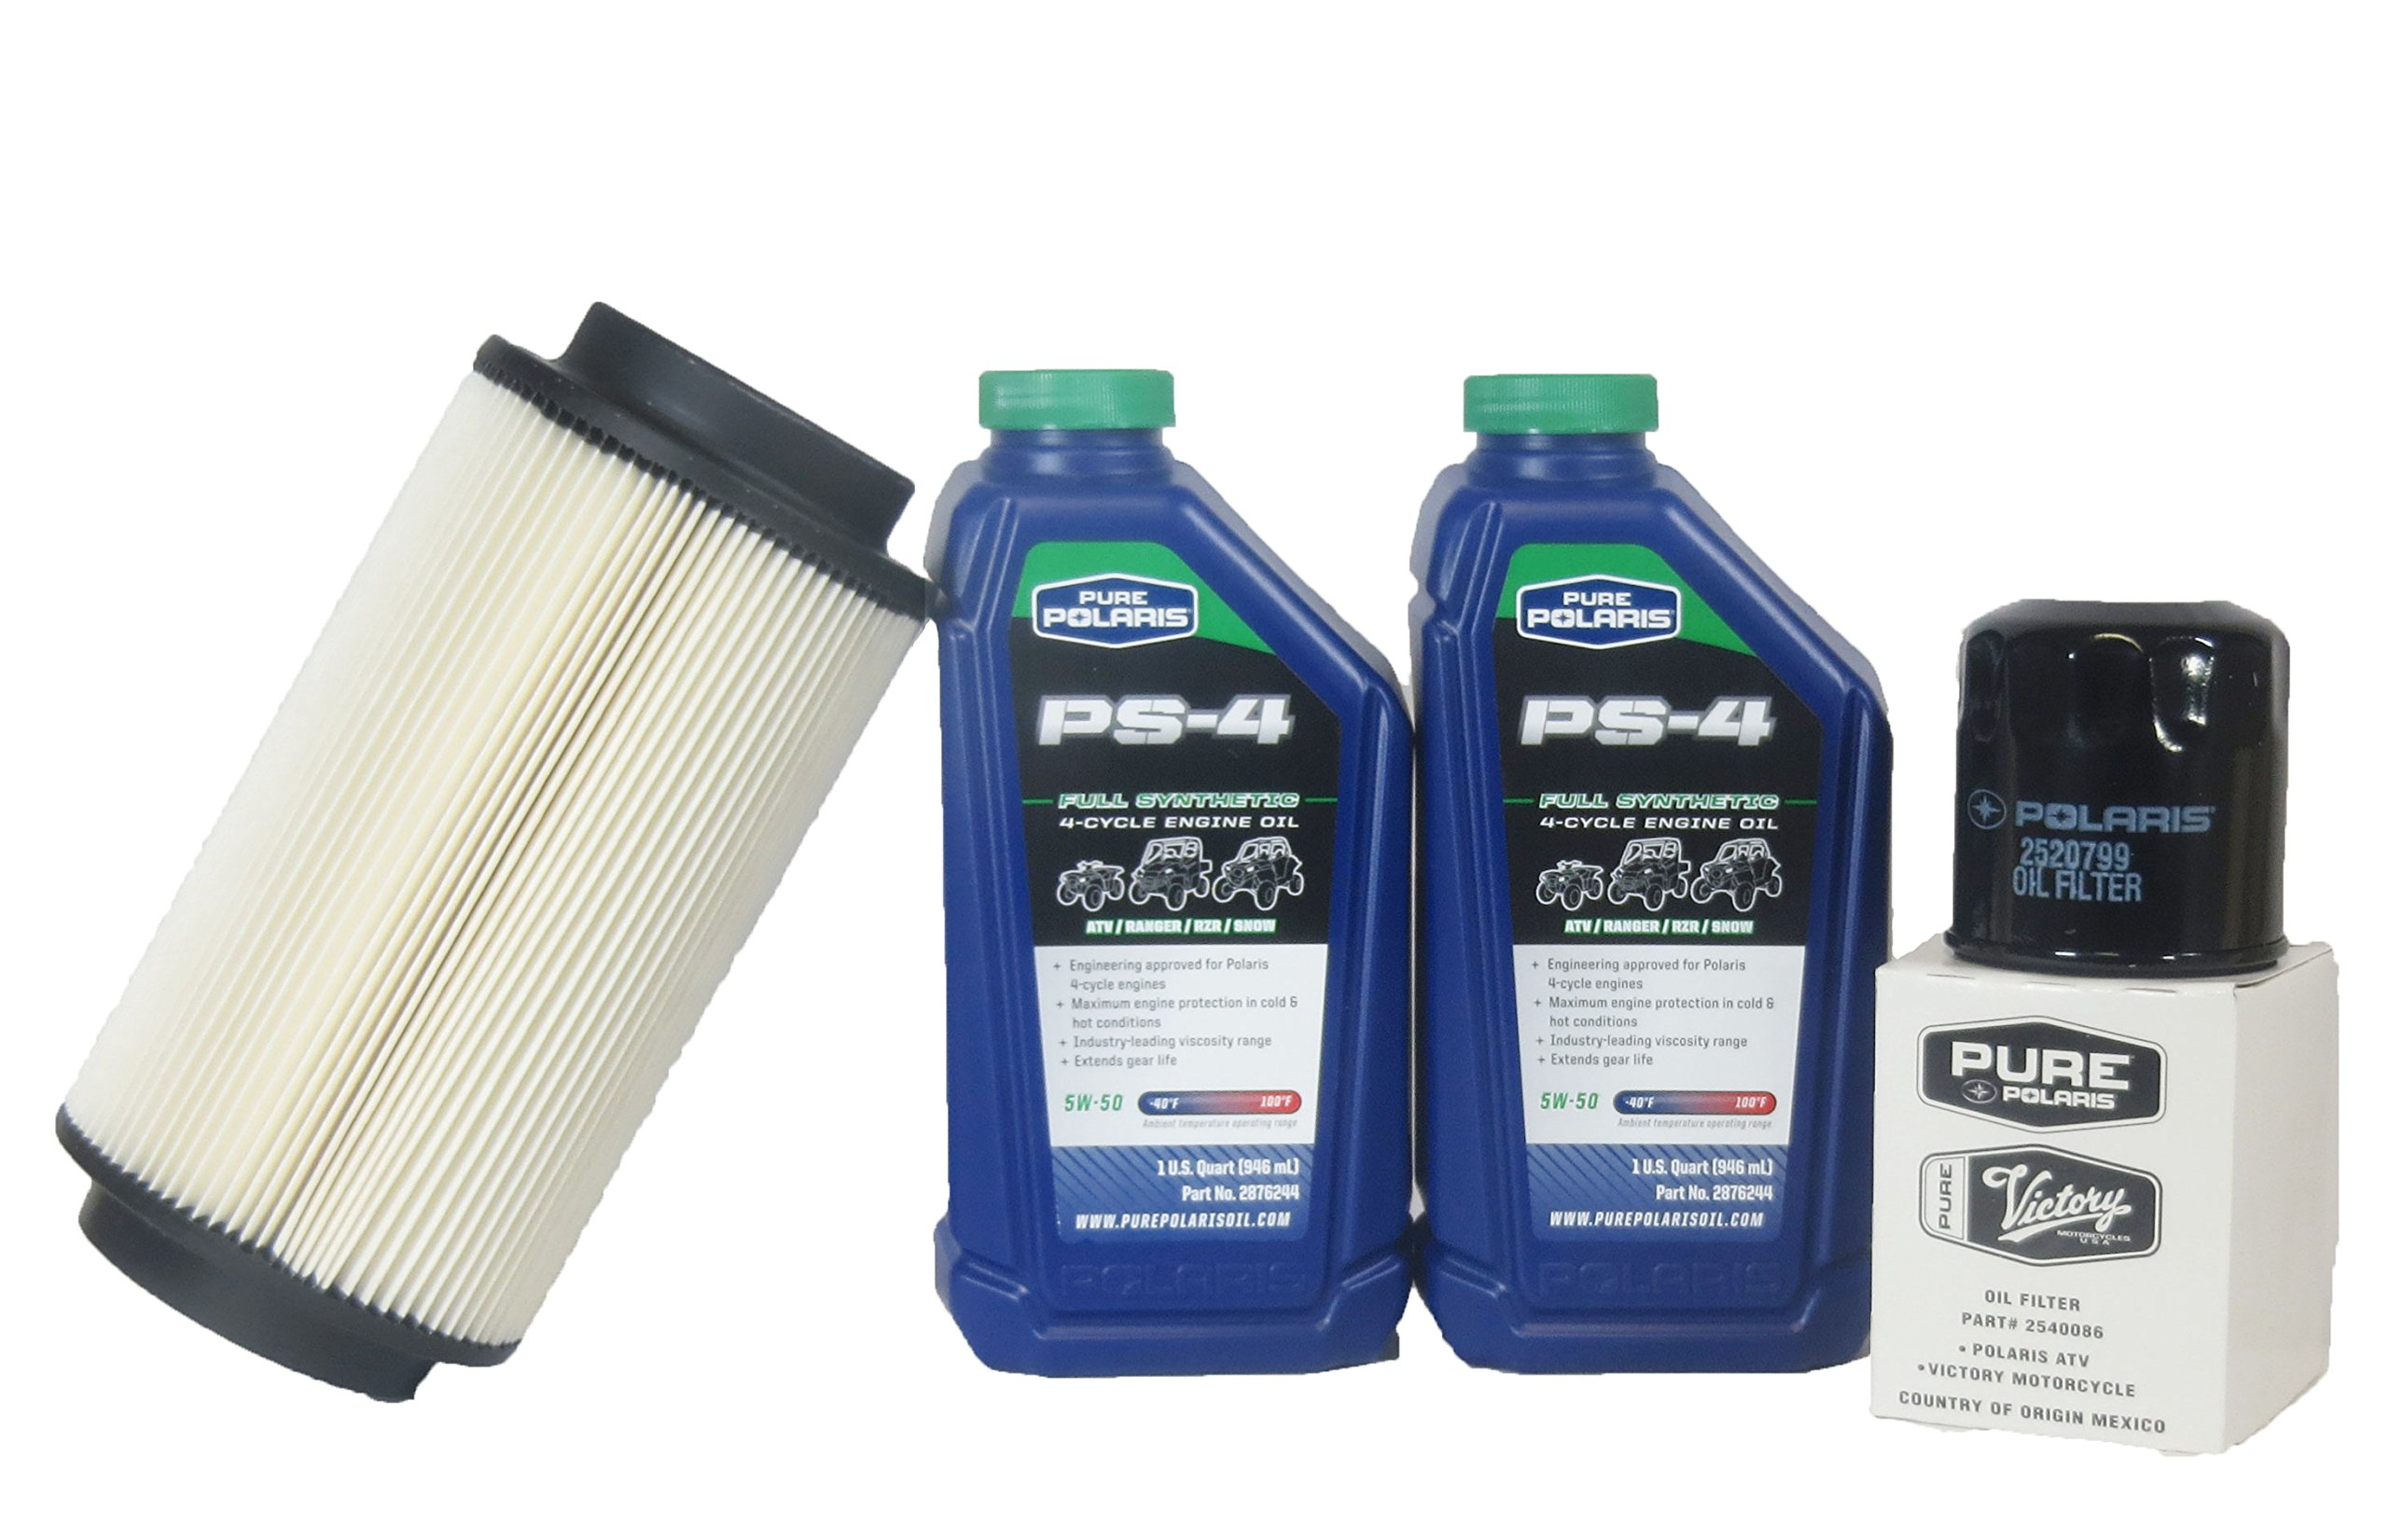 2001-2013 Sportsman 500 Ho Genuine Polaris Oil Change and Air Filter Kit by Polaris